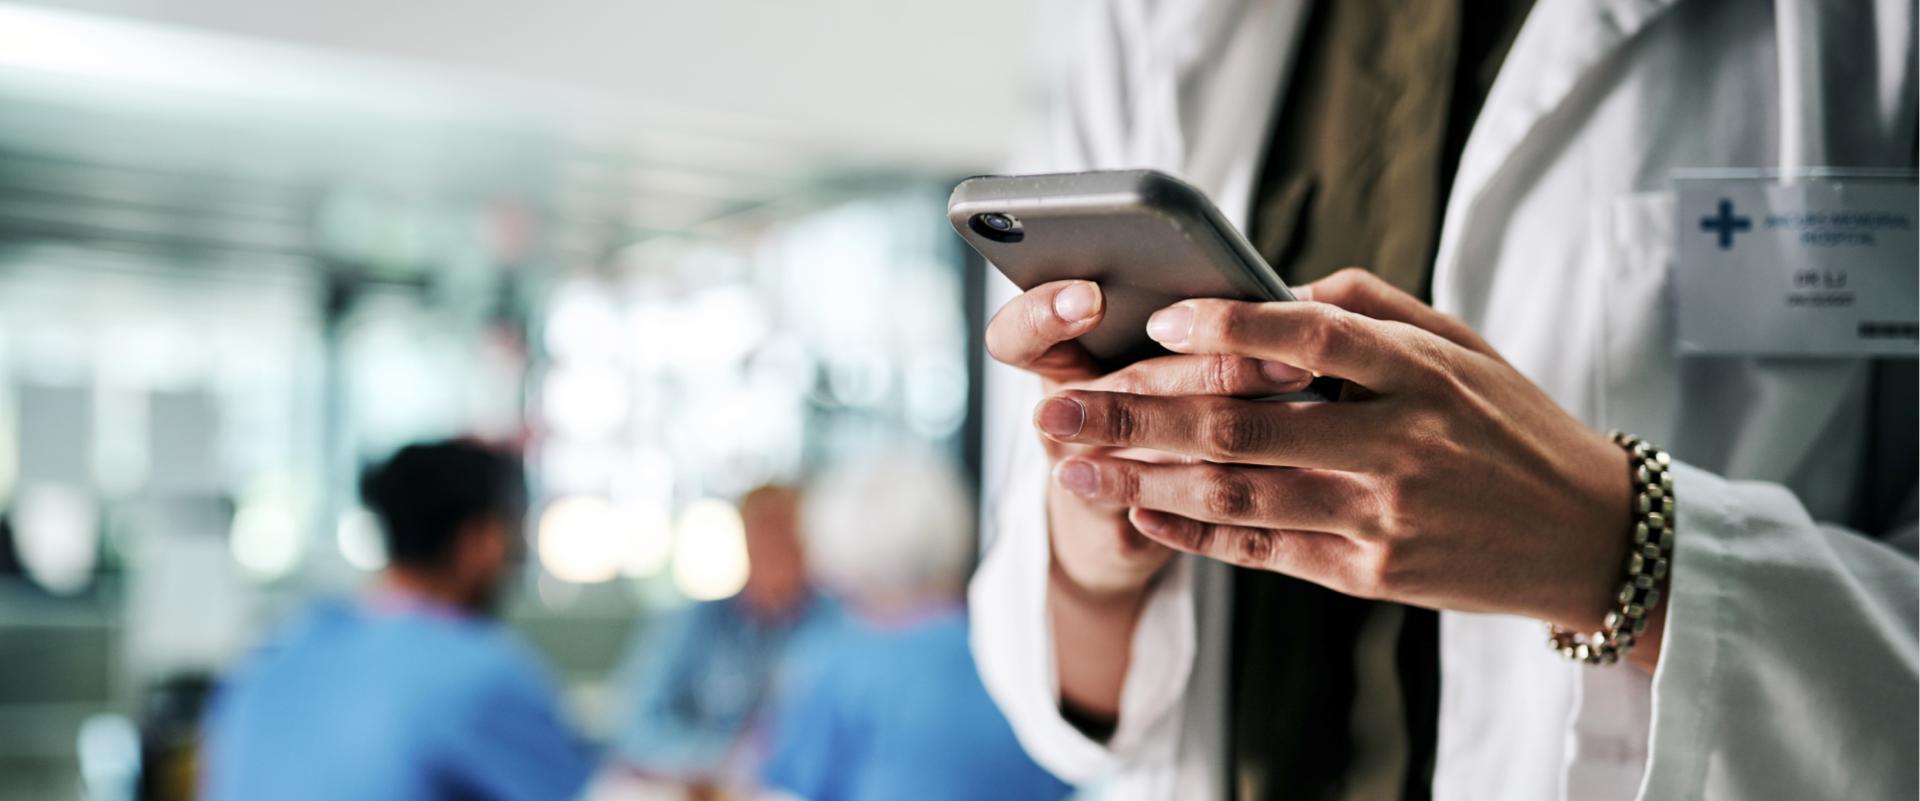 Health care provider using phone